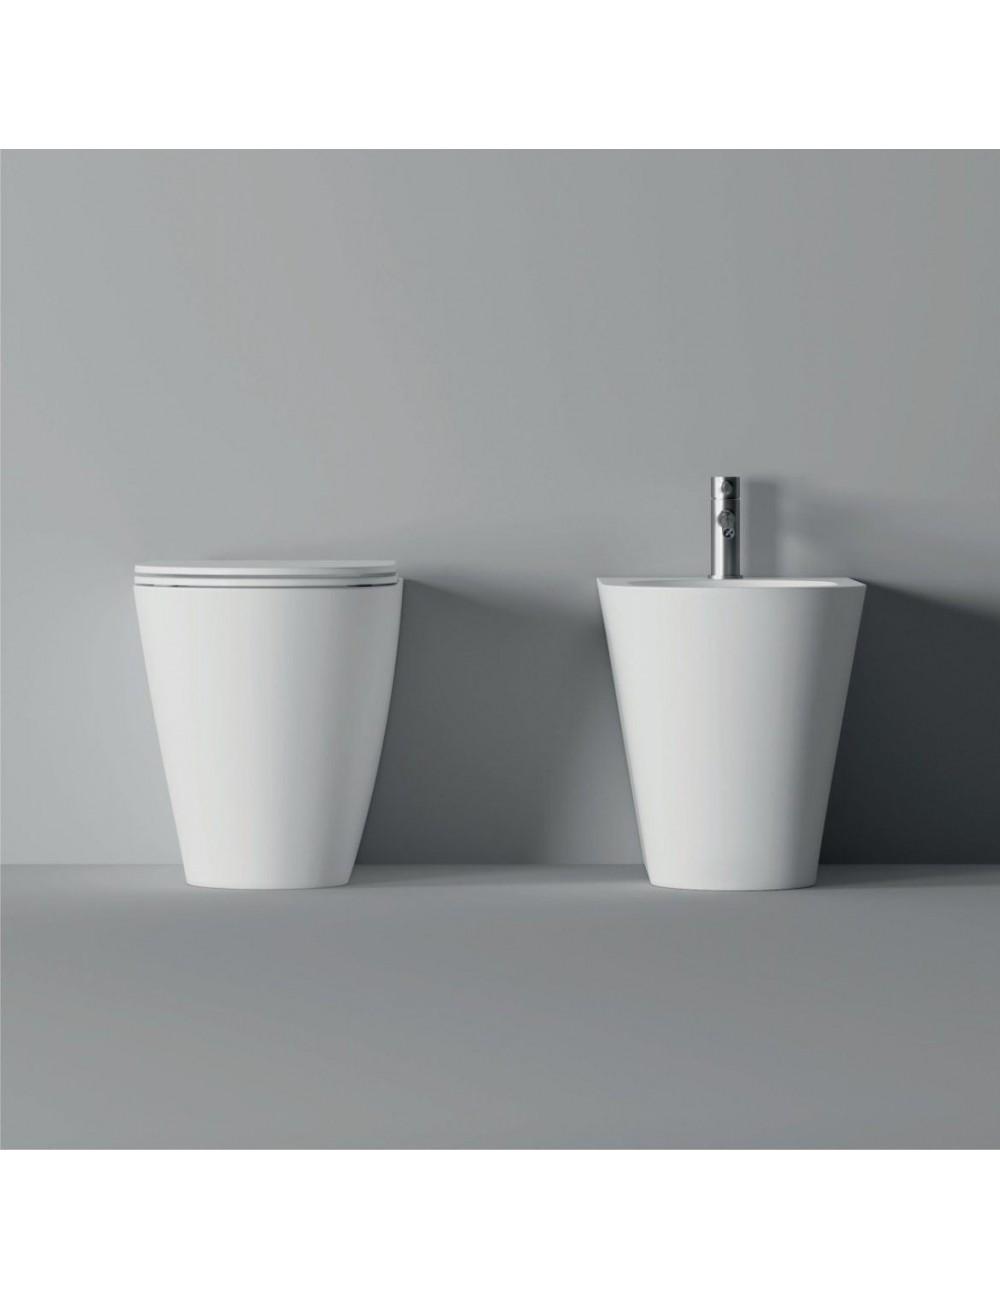 coppia di sanitari a terra Hide round di Alice ceramica